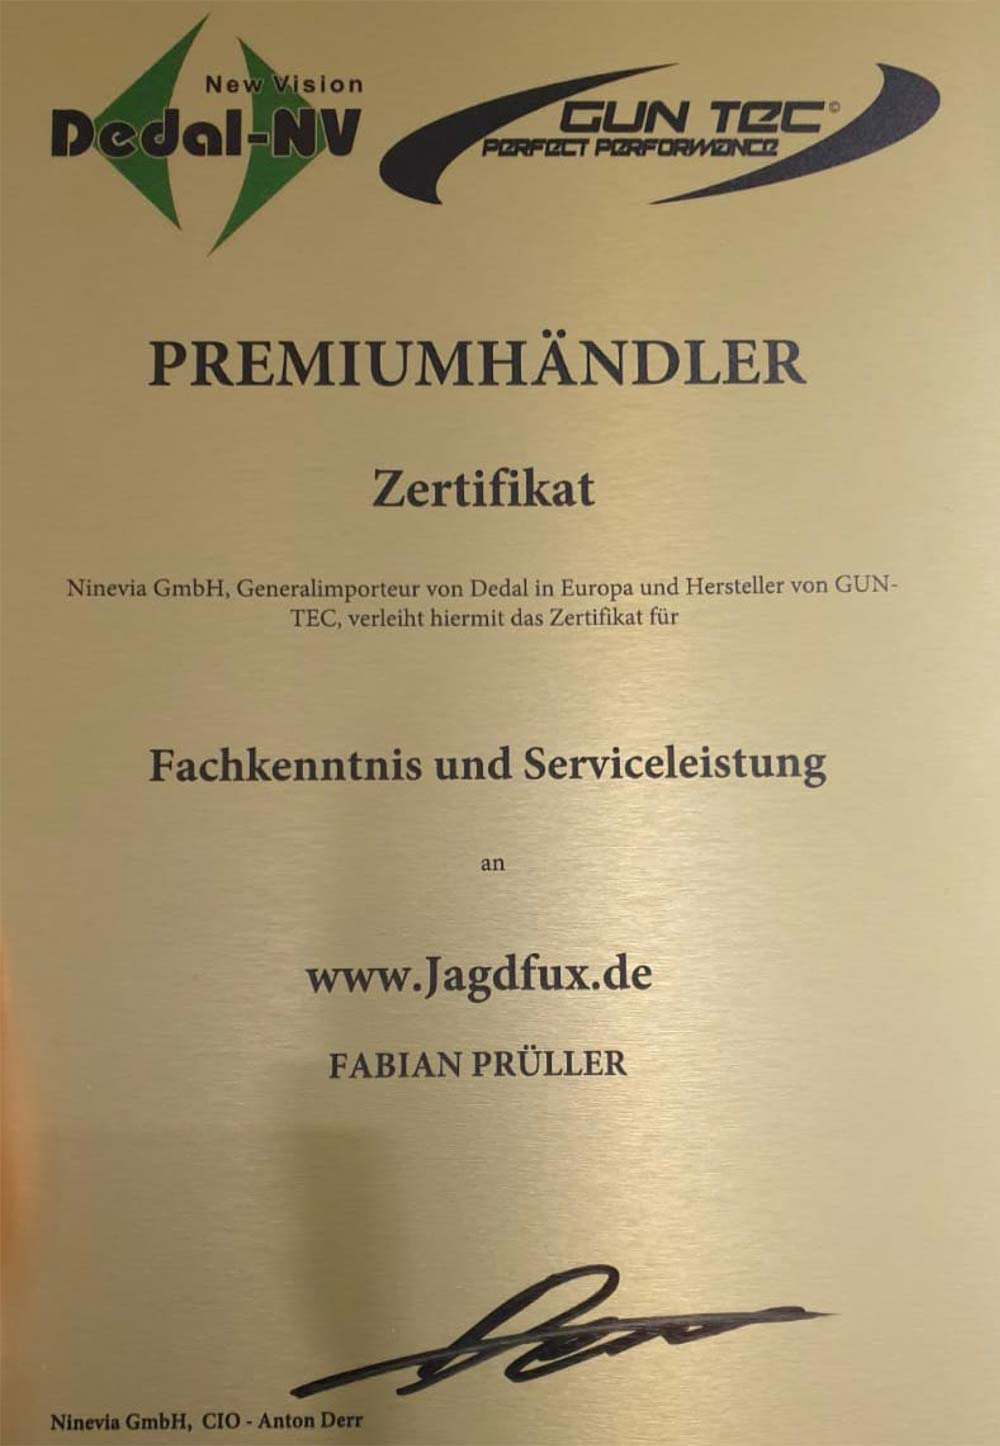 Jagdfux Zertifikat - Dedal Premiumhändler